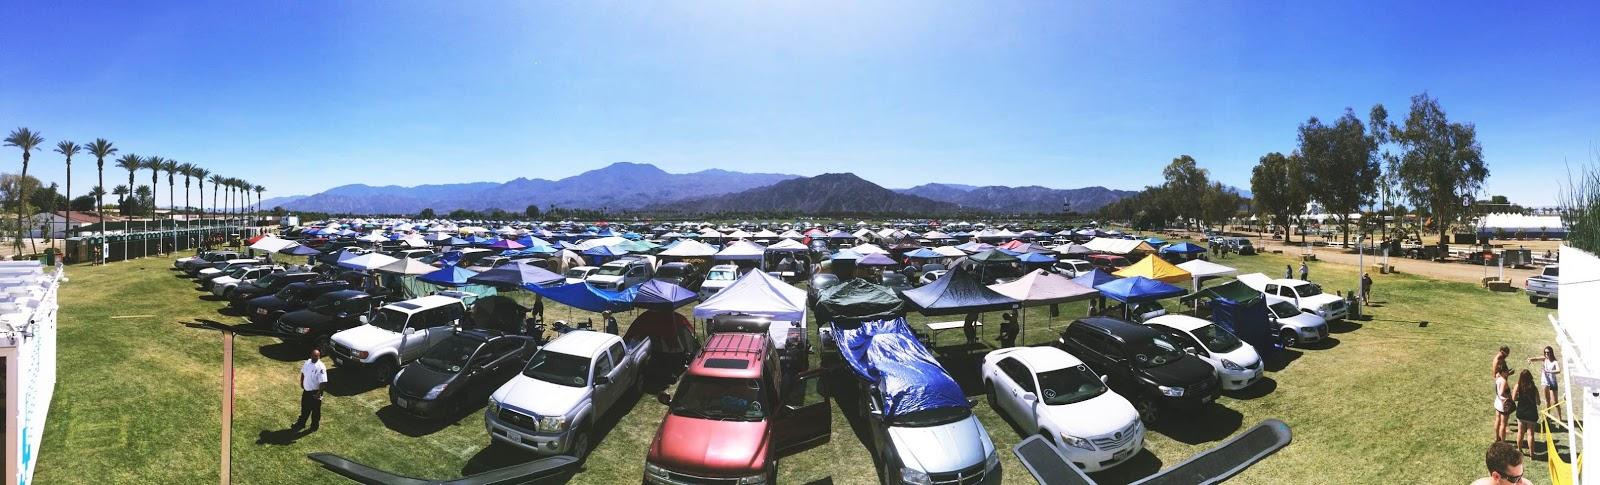 coachella camping